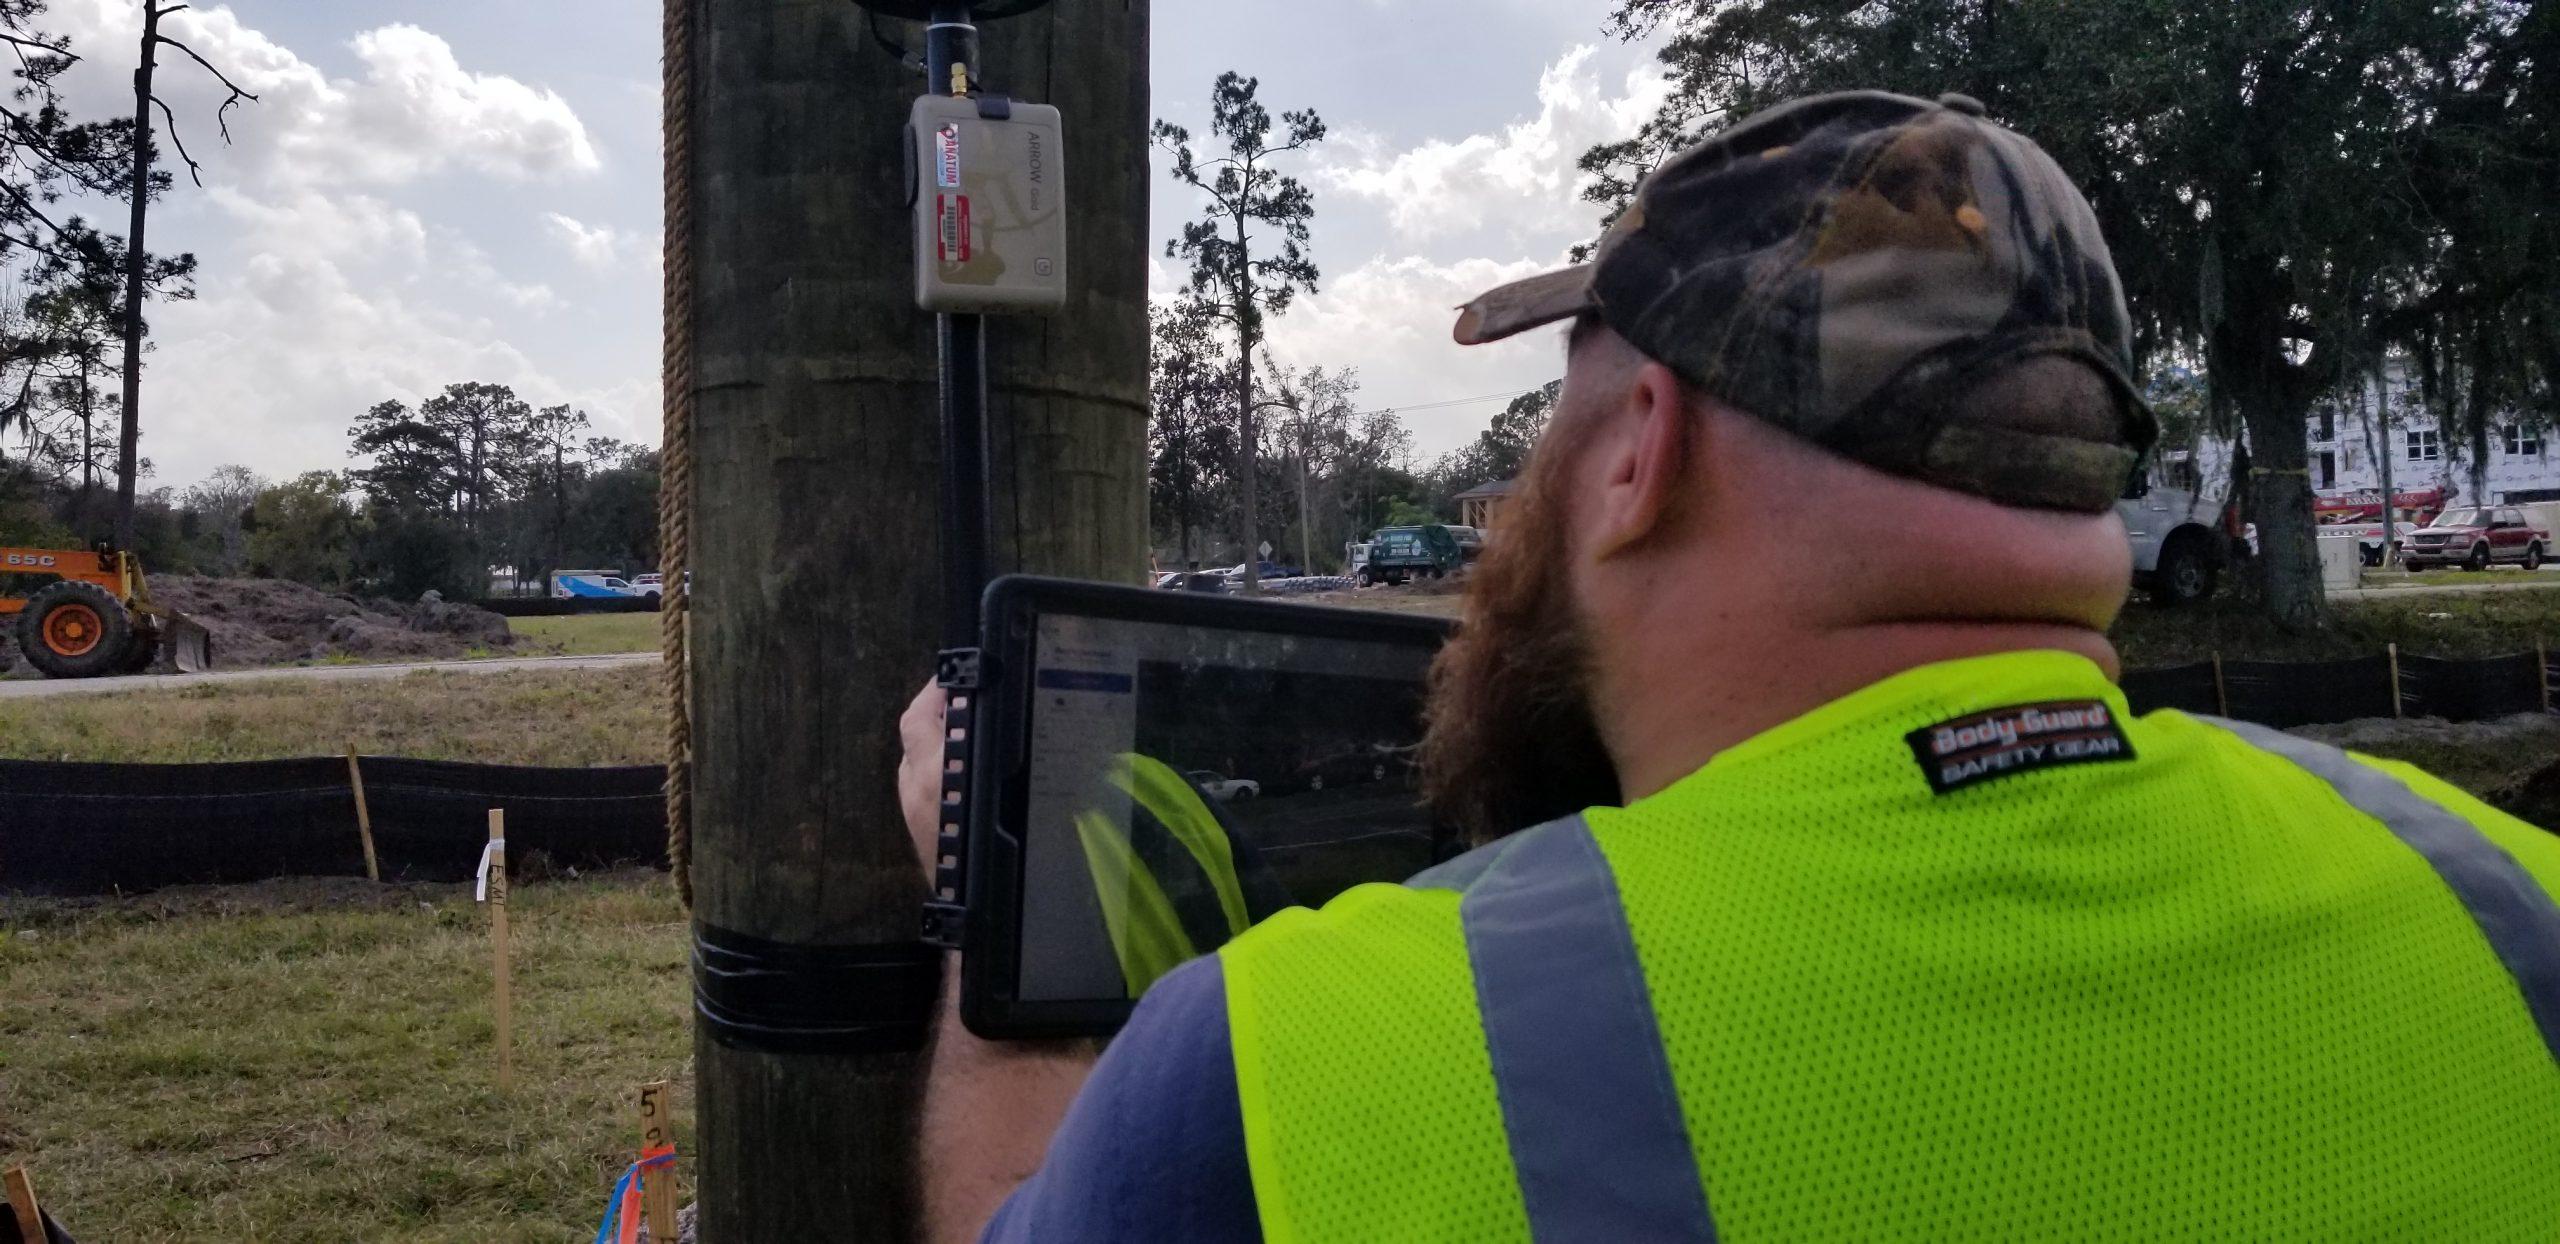 GPS Pole Capture Close Up New Smyrna Beach Utilities Commission Florida